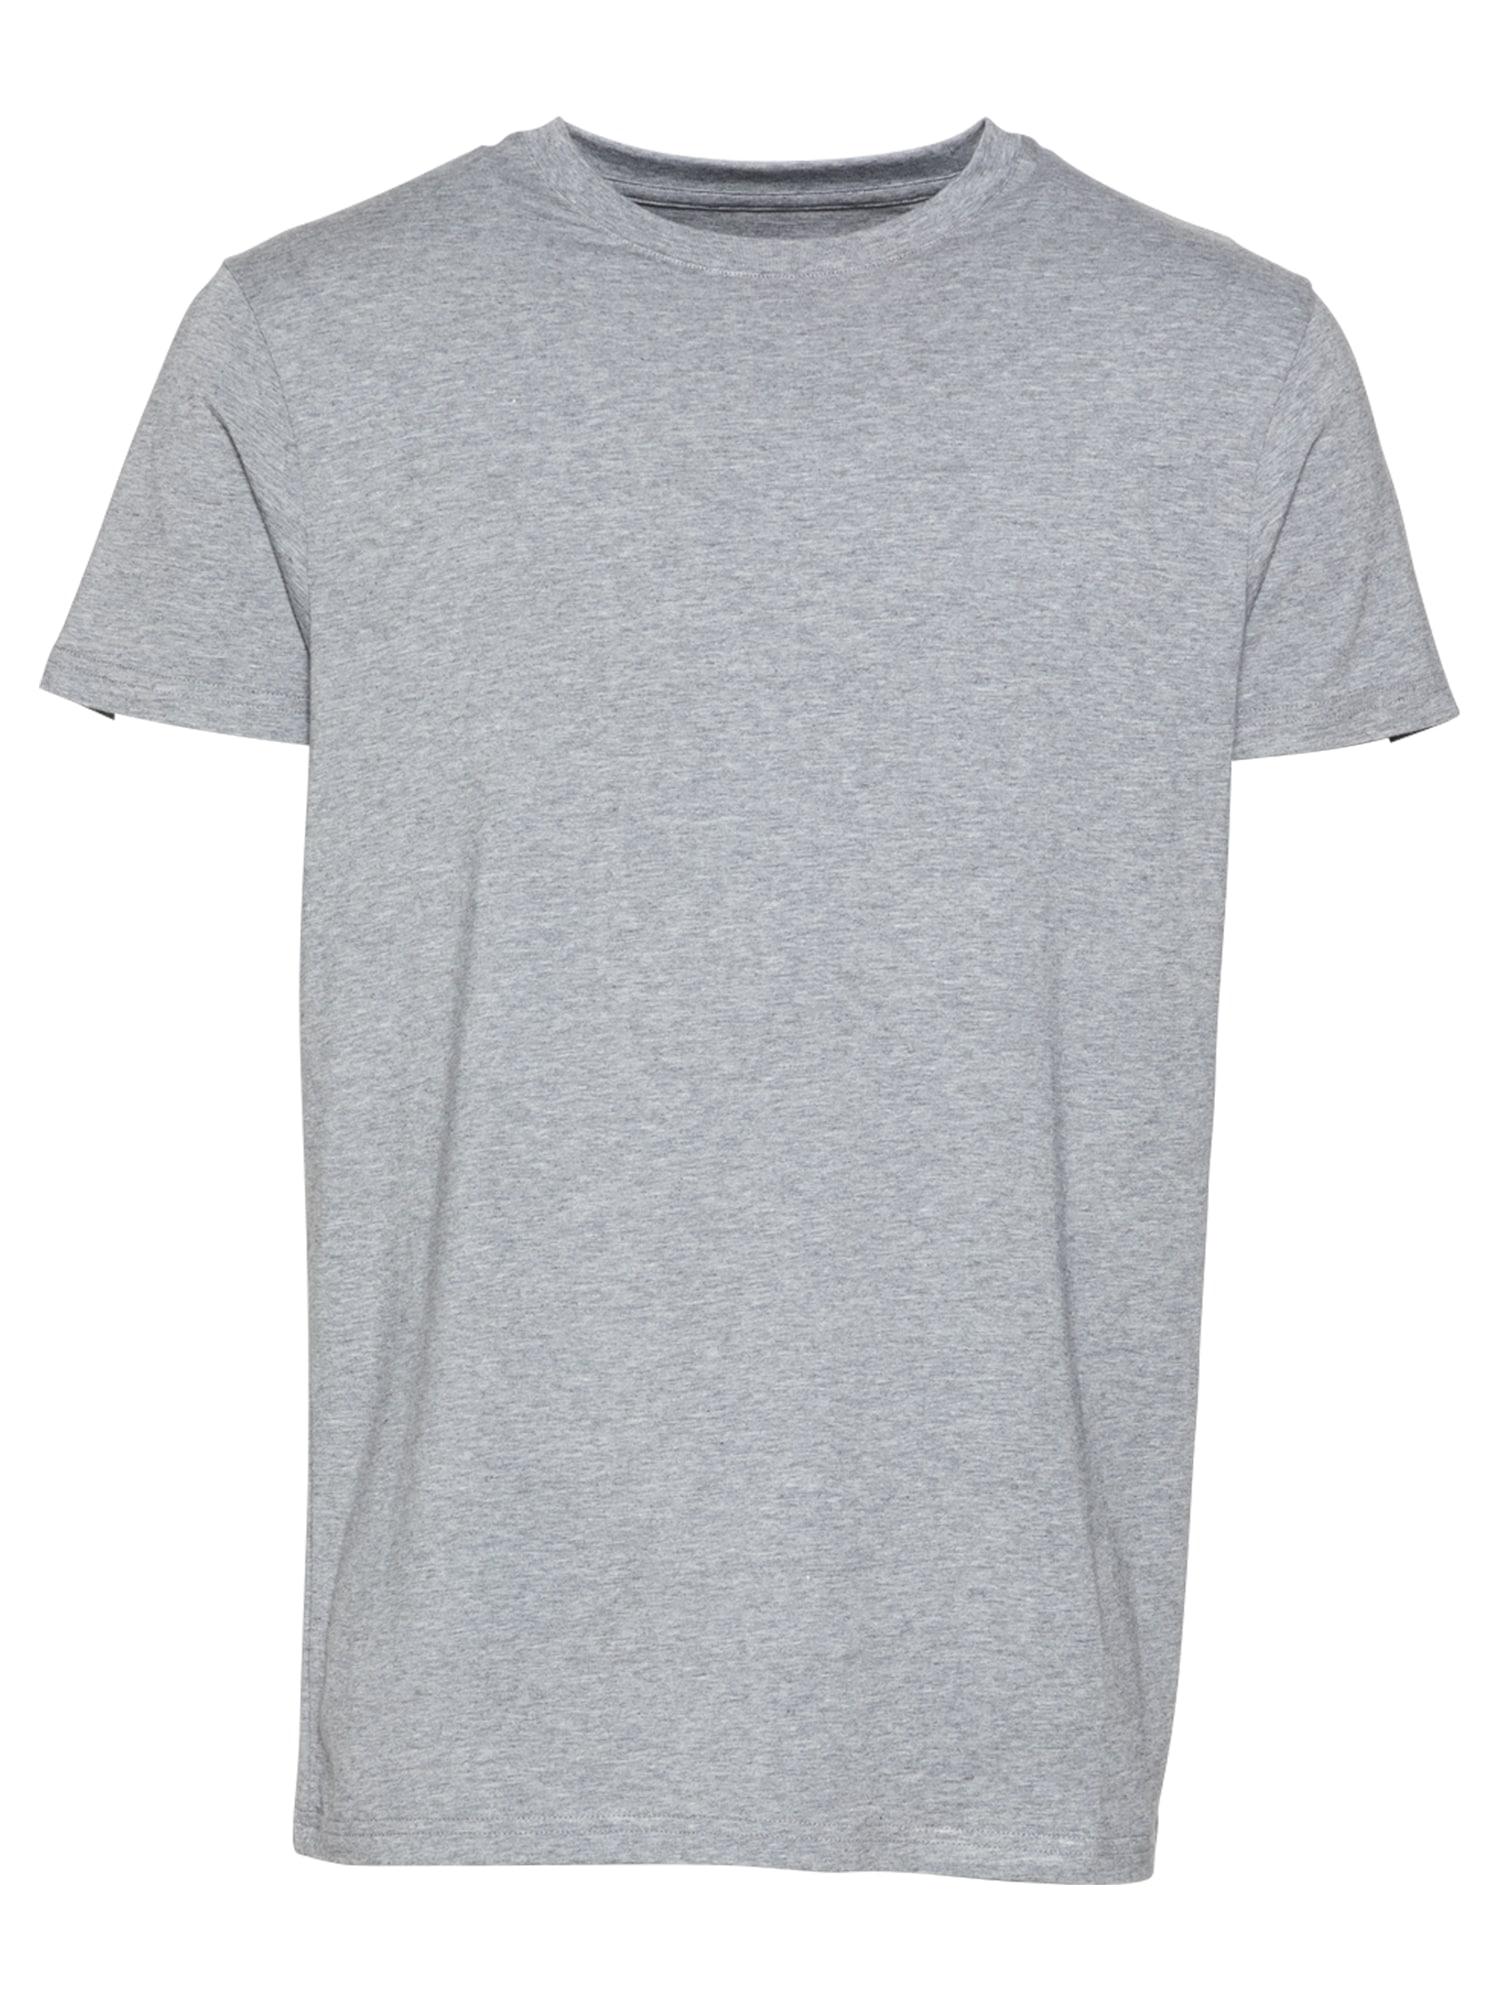 Resteröds Marškinėliai margai pilka